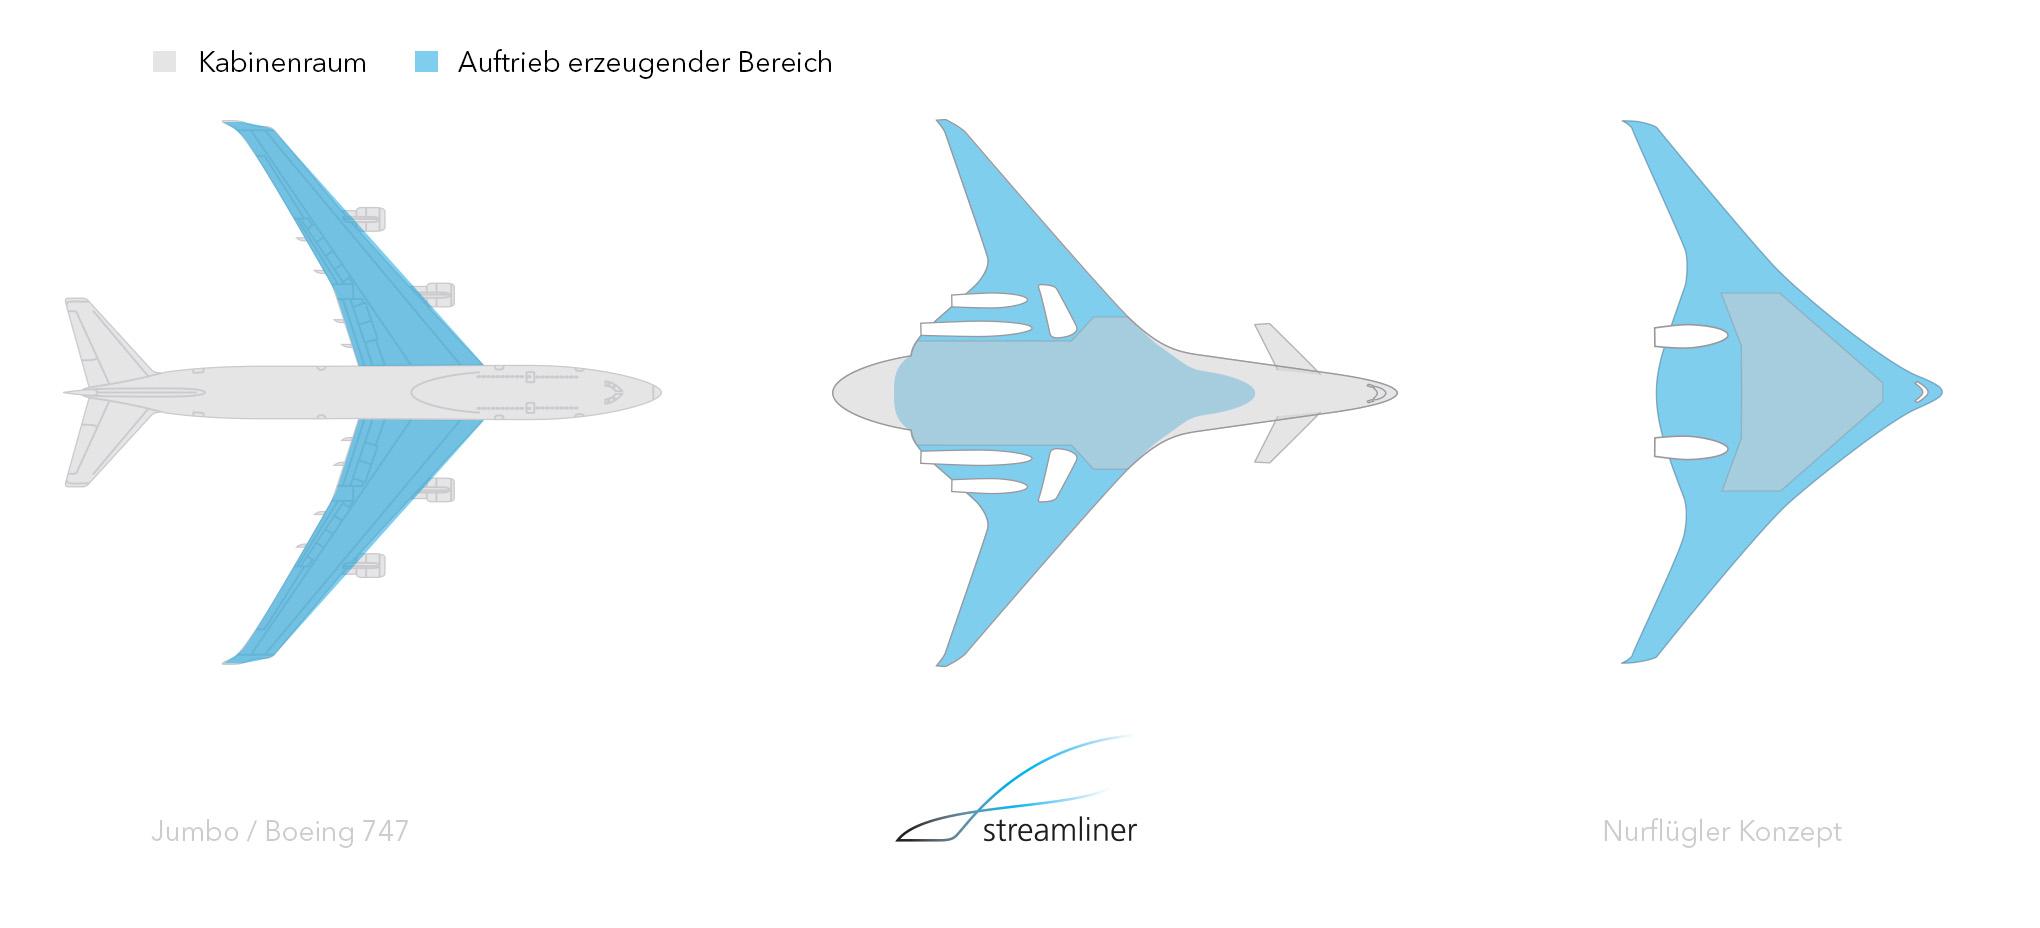 streamliner-vergleich_de